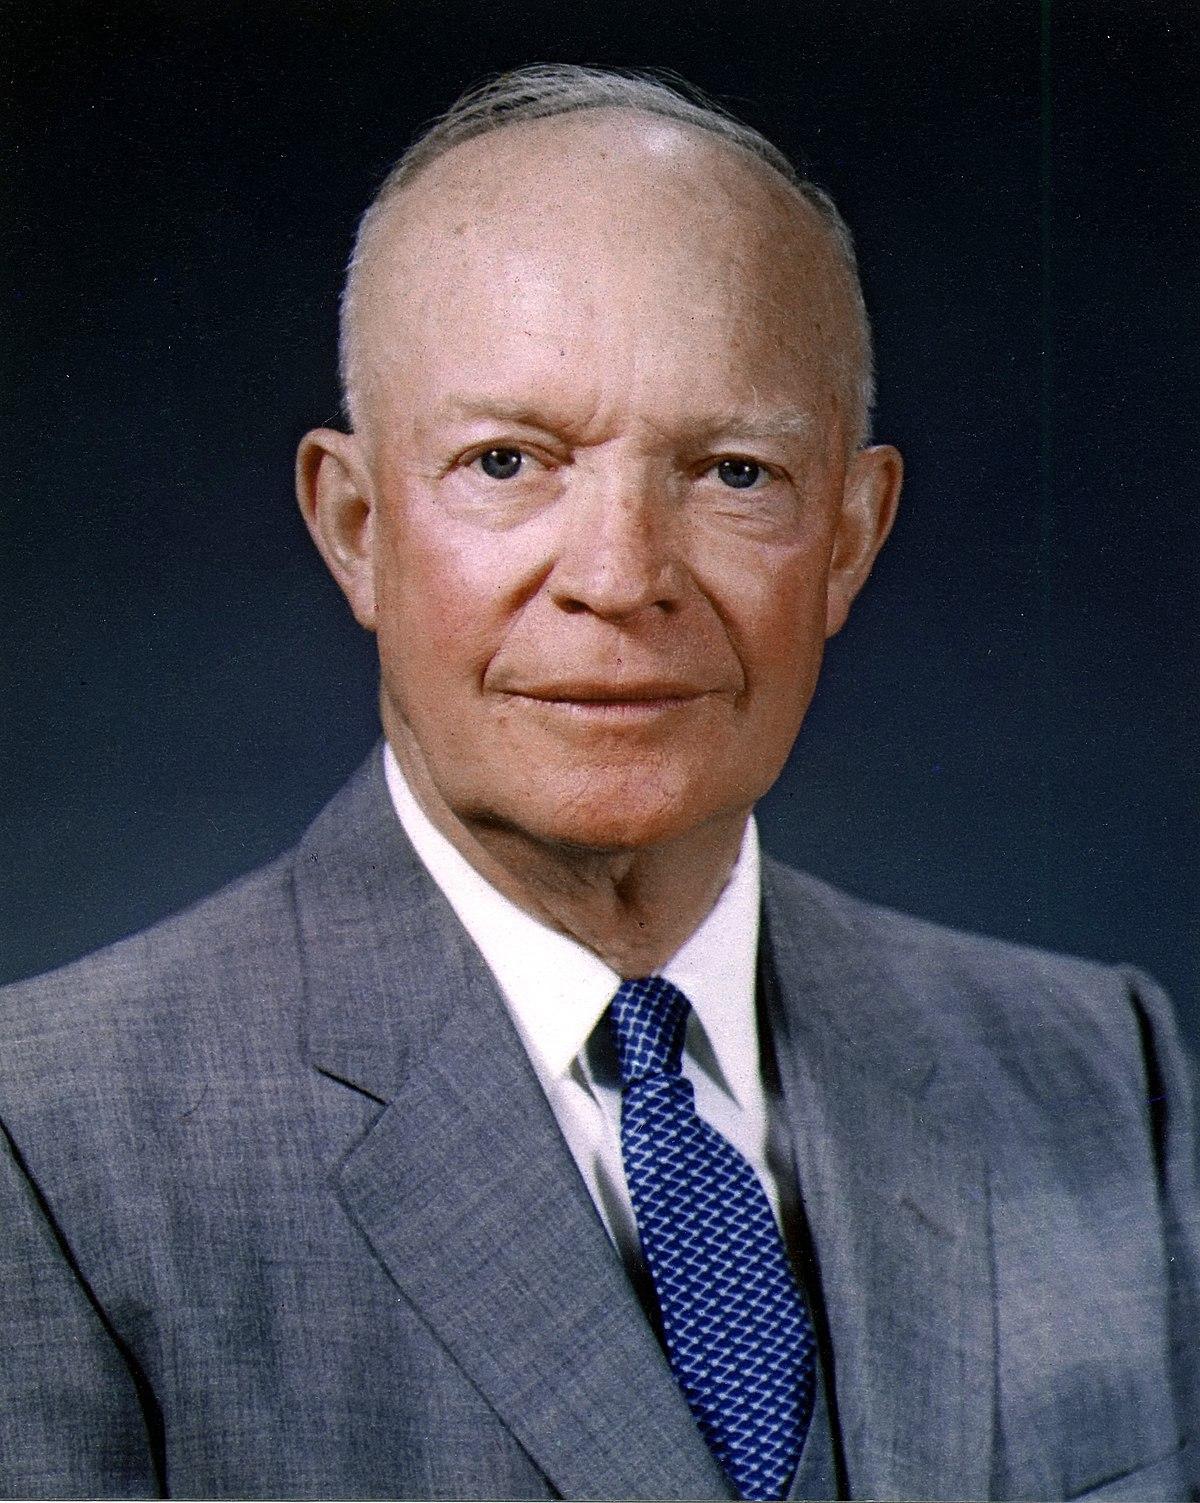 [Eisenhower]